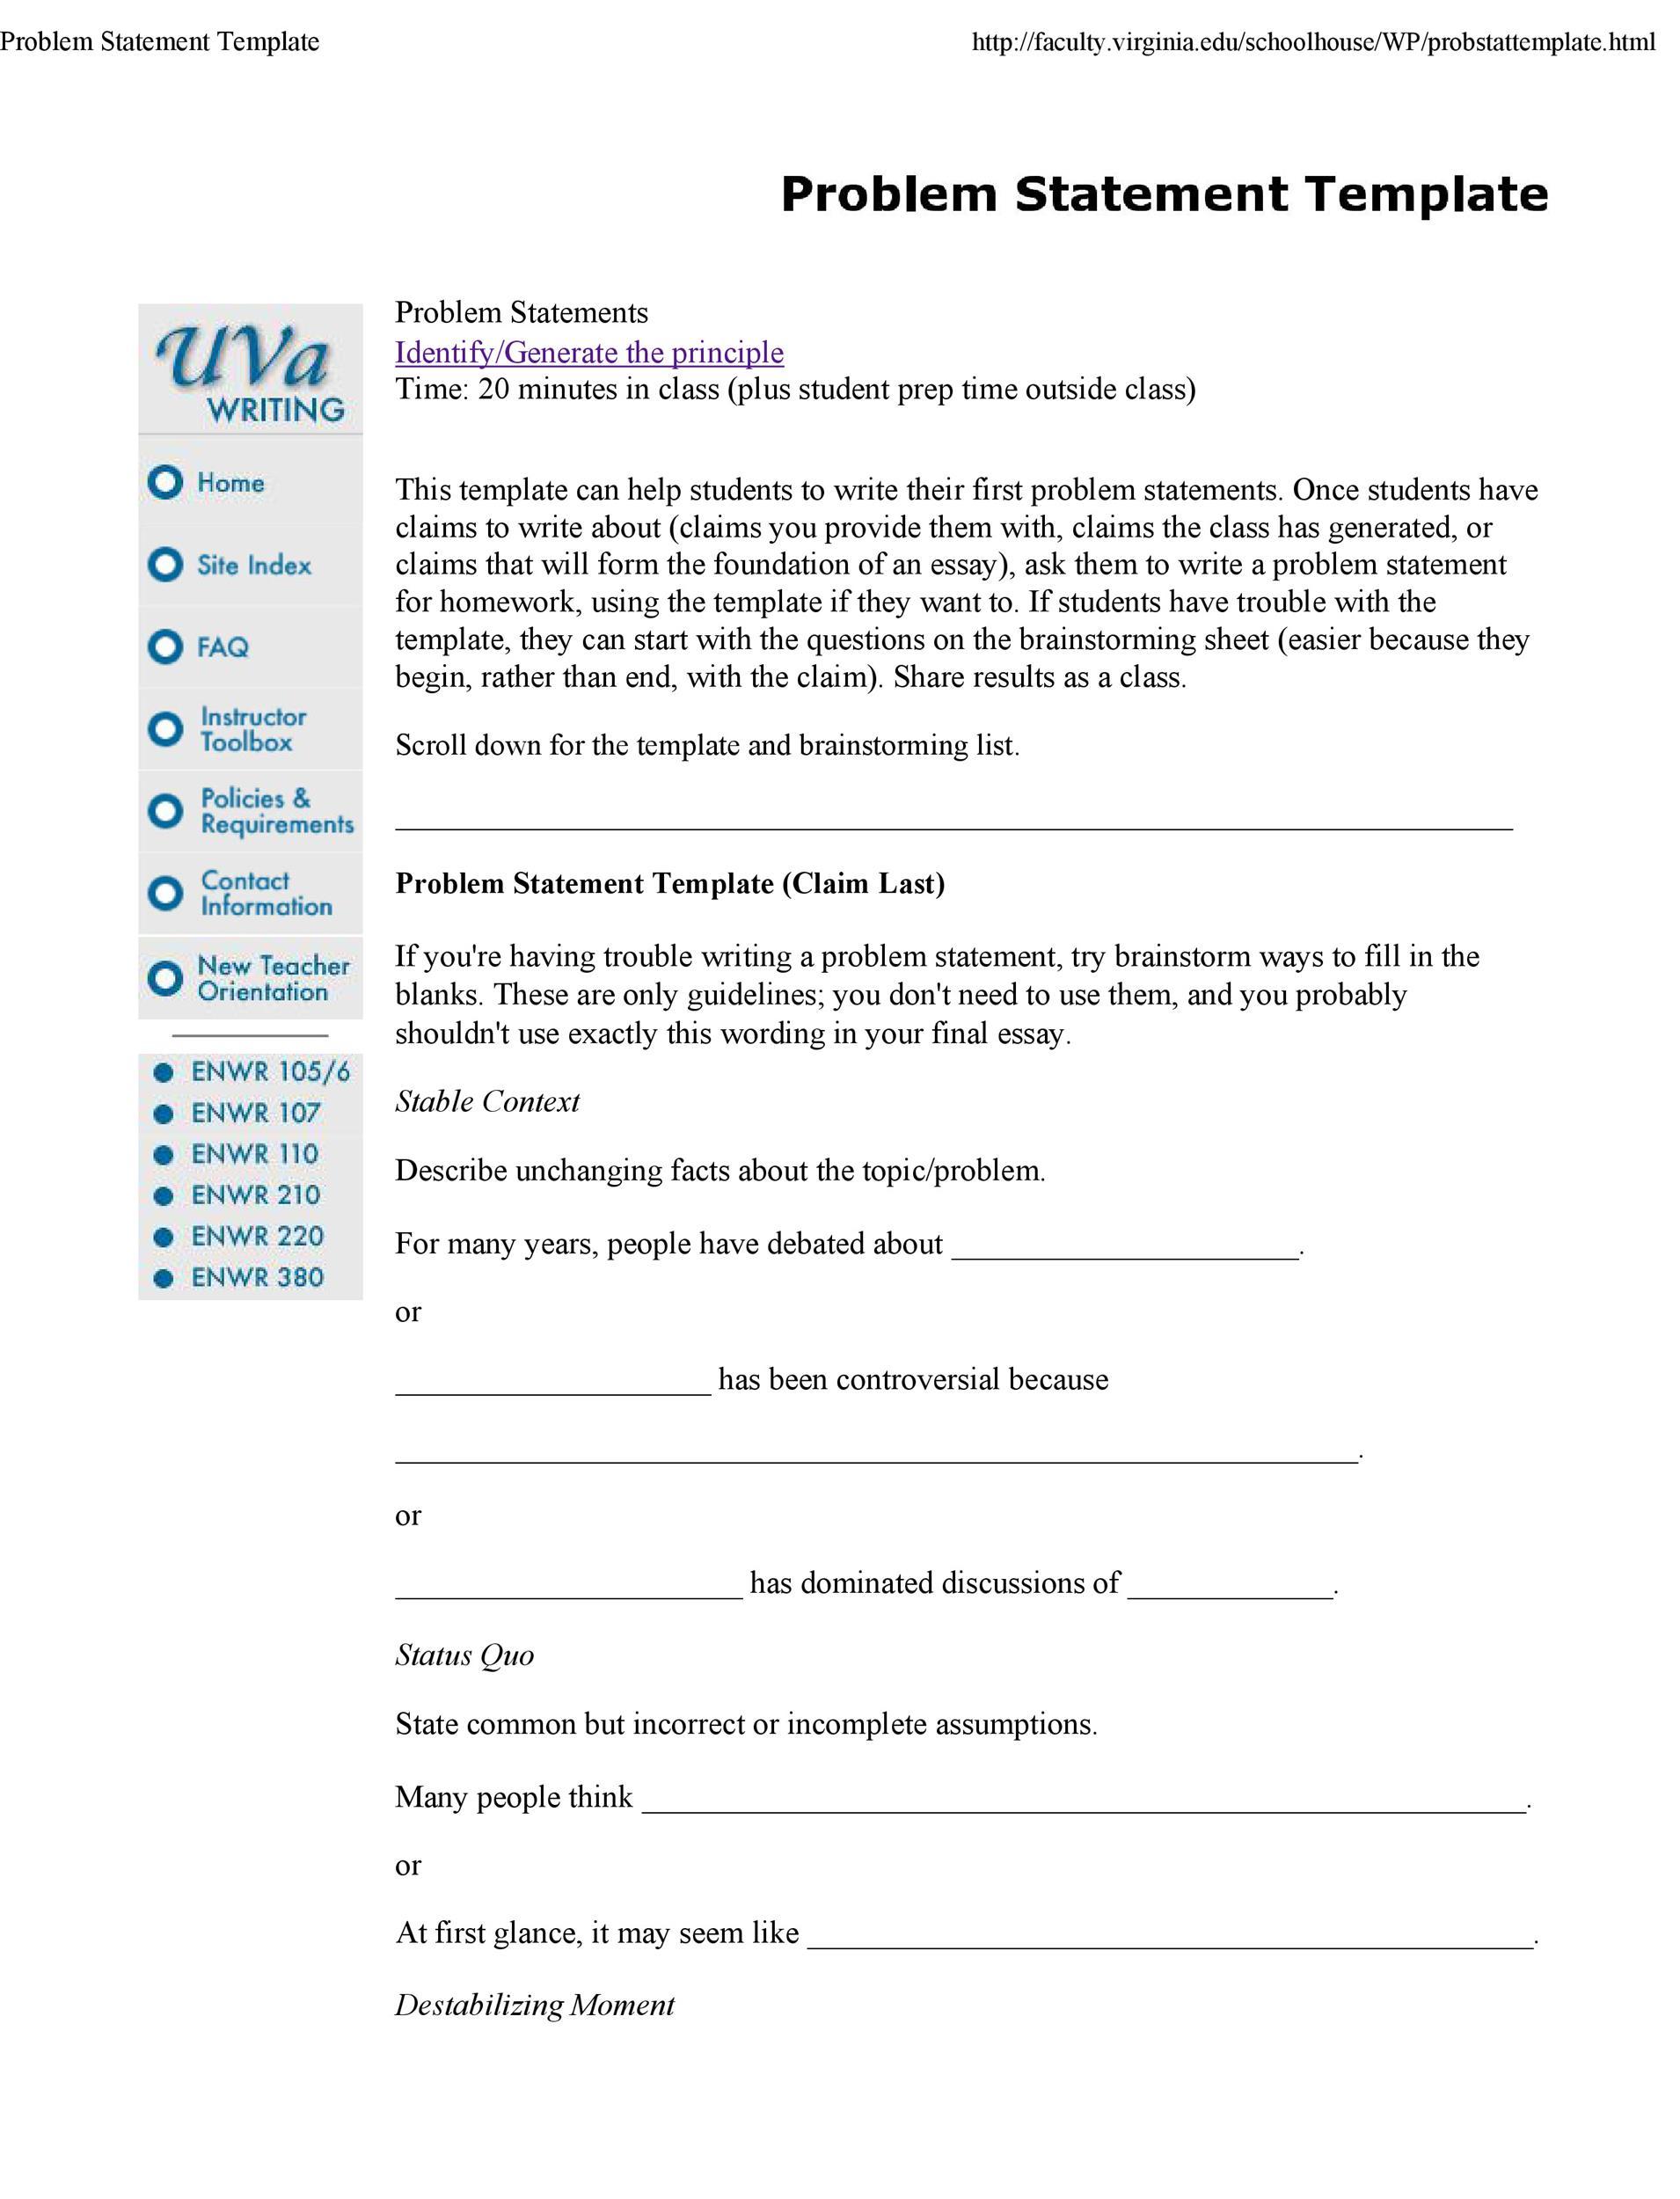 Free Problem Statement Template 03